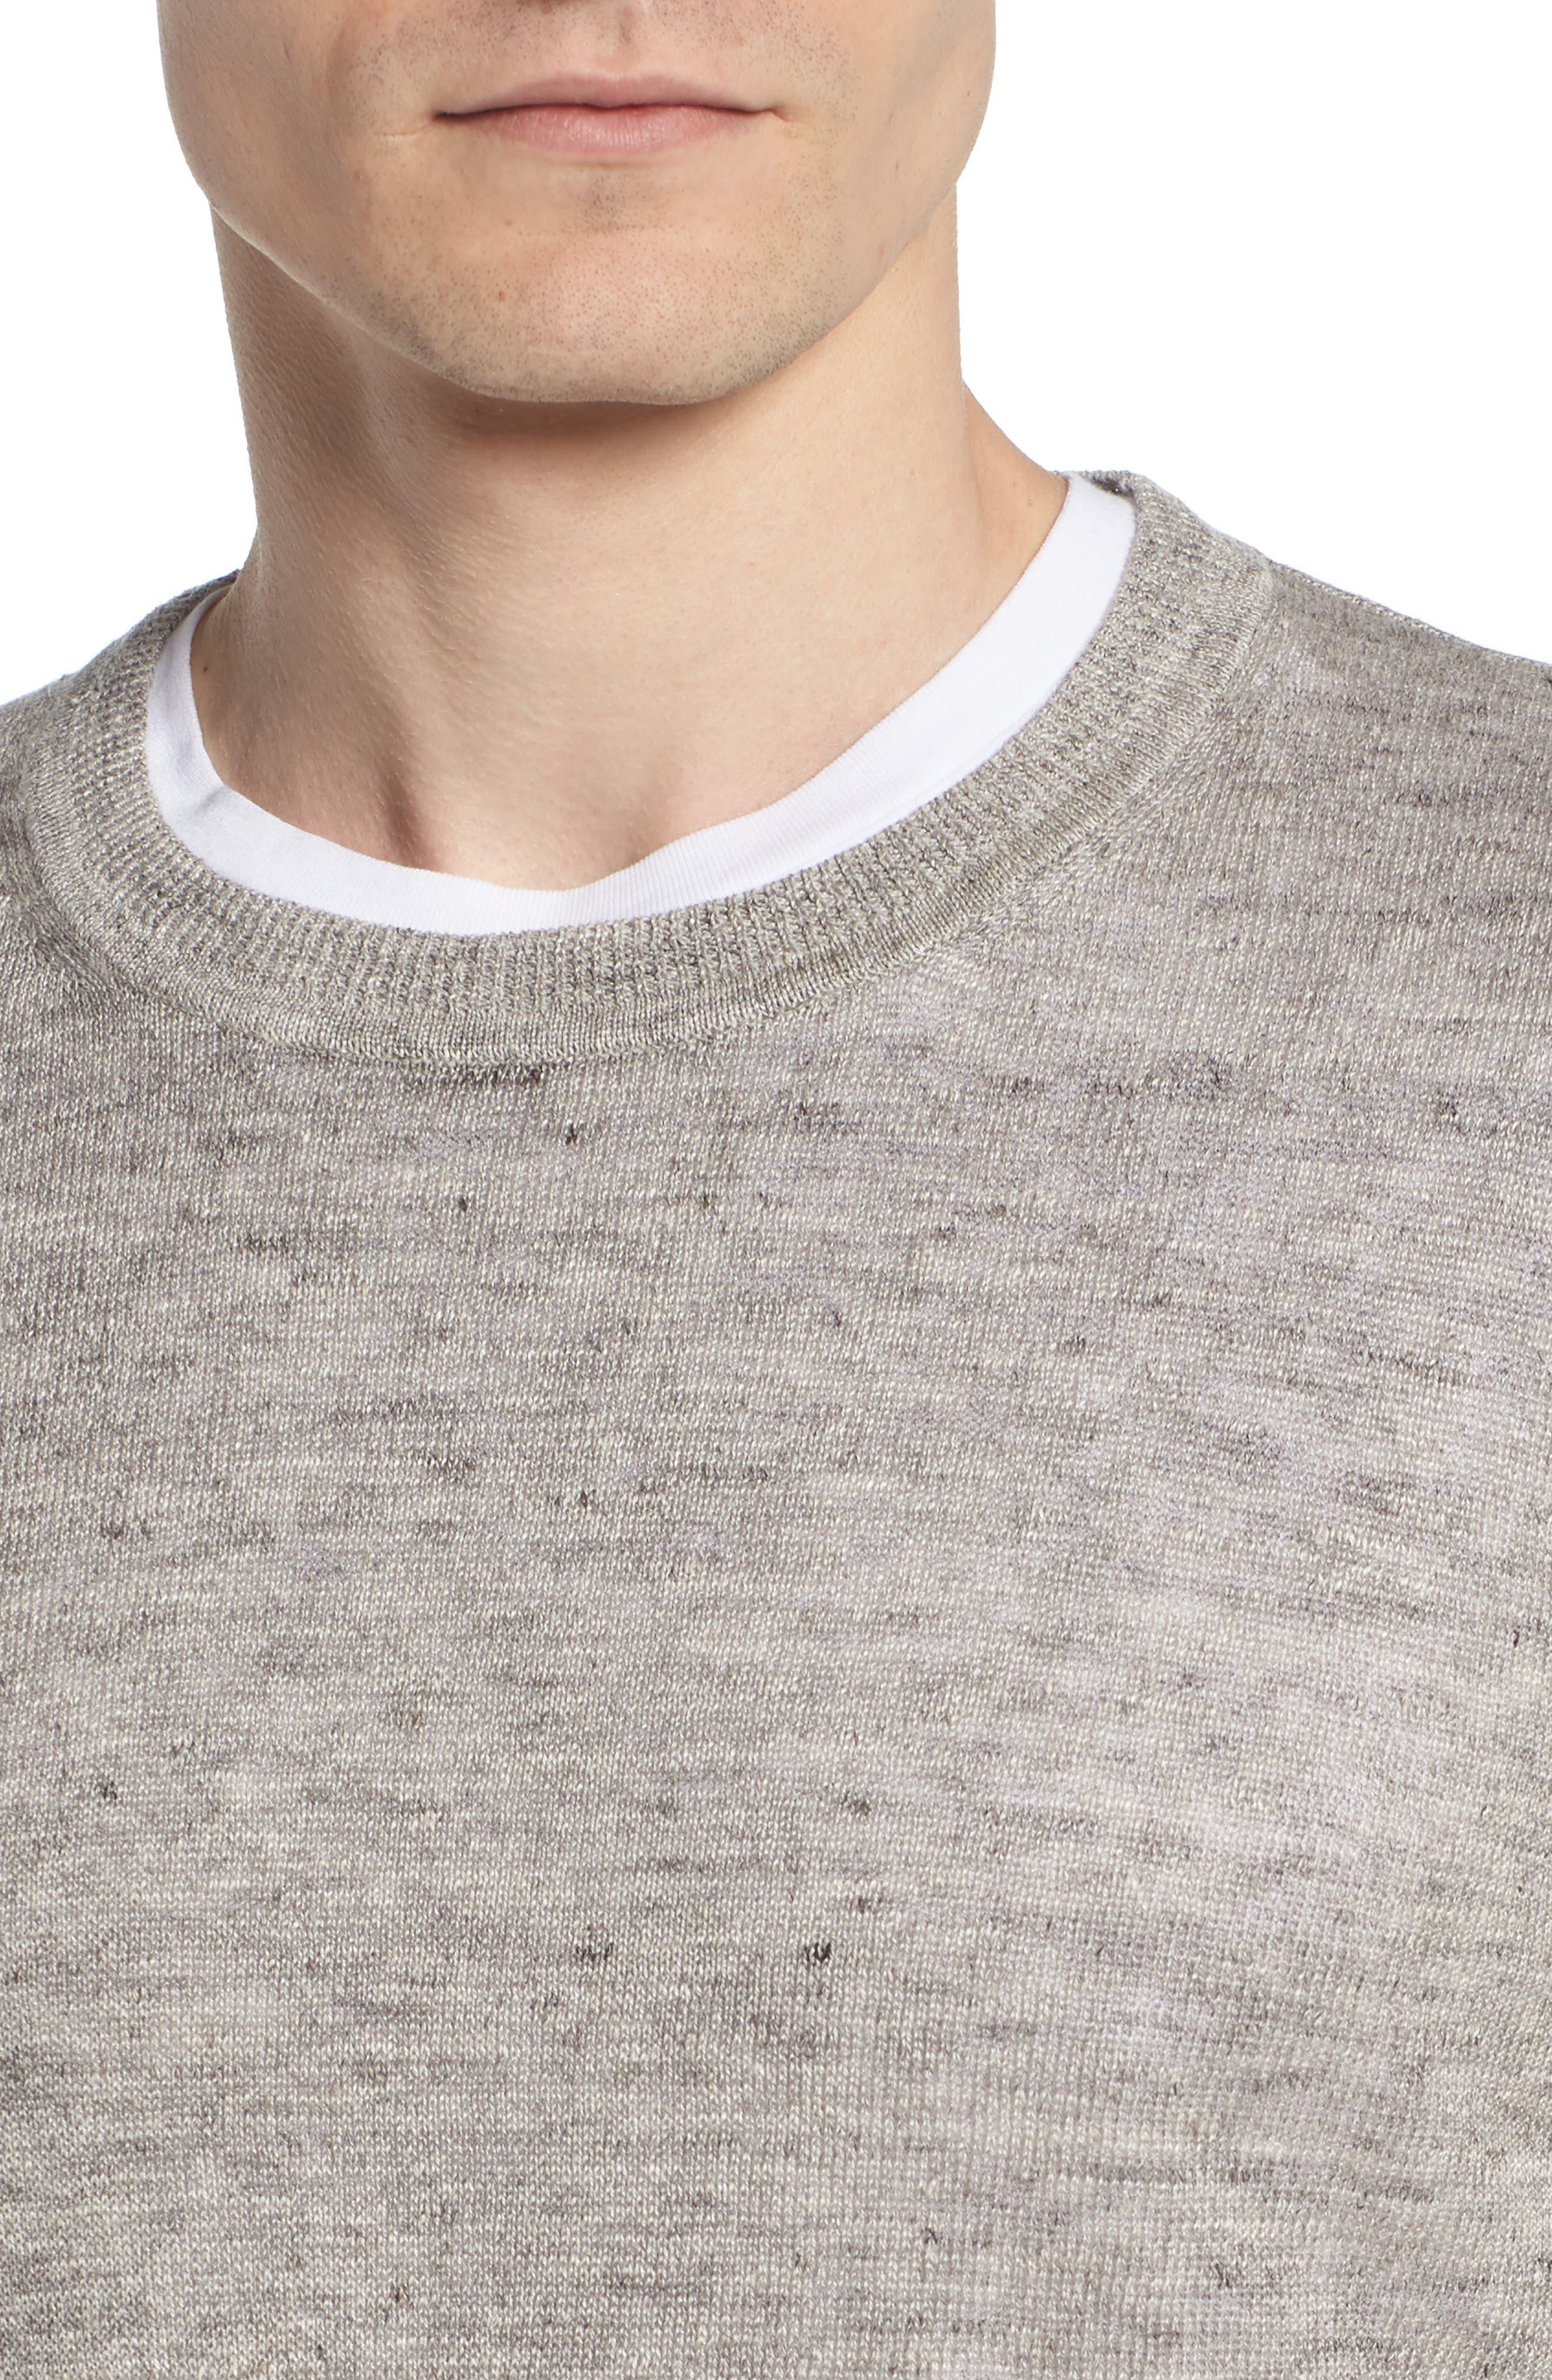 Heyward Long Sleeve T-Shirt,                             Alternate thumbnail 4, color,                             Heather Grey